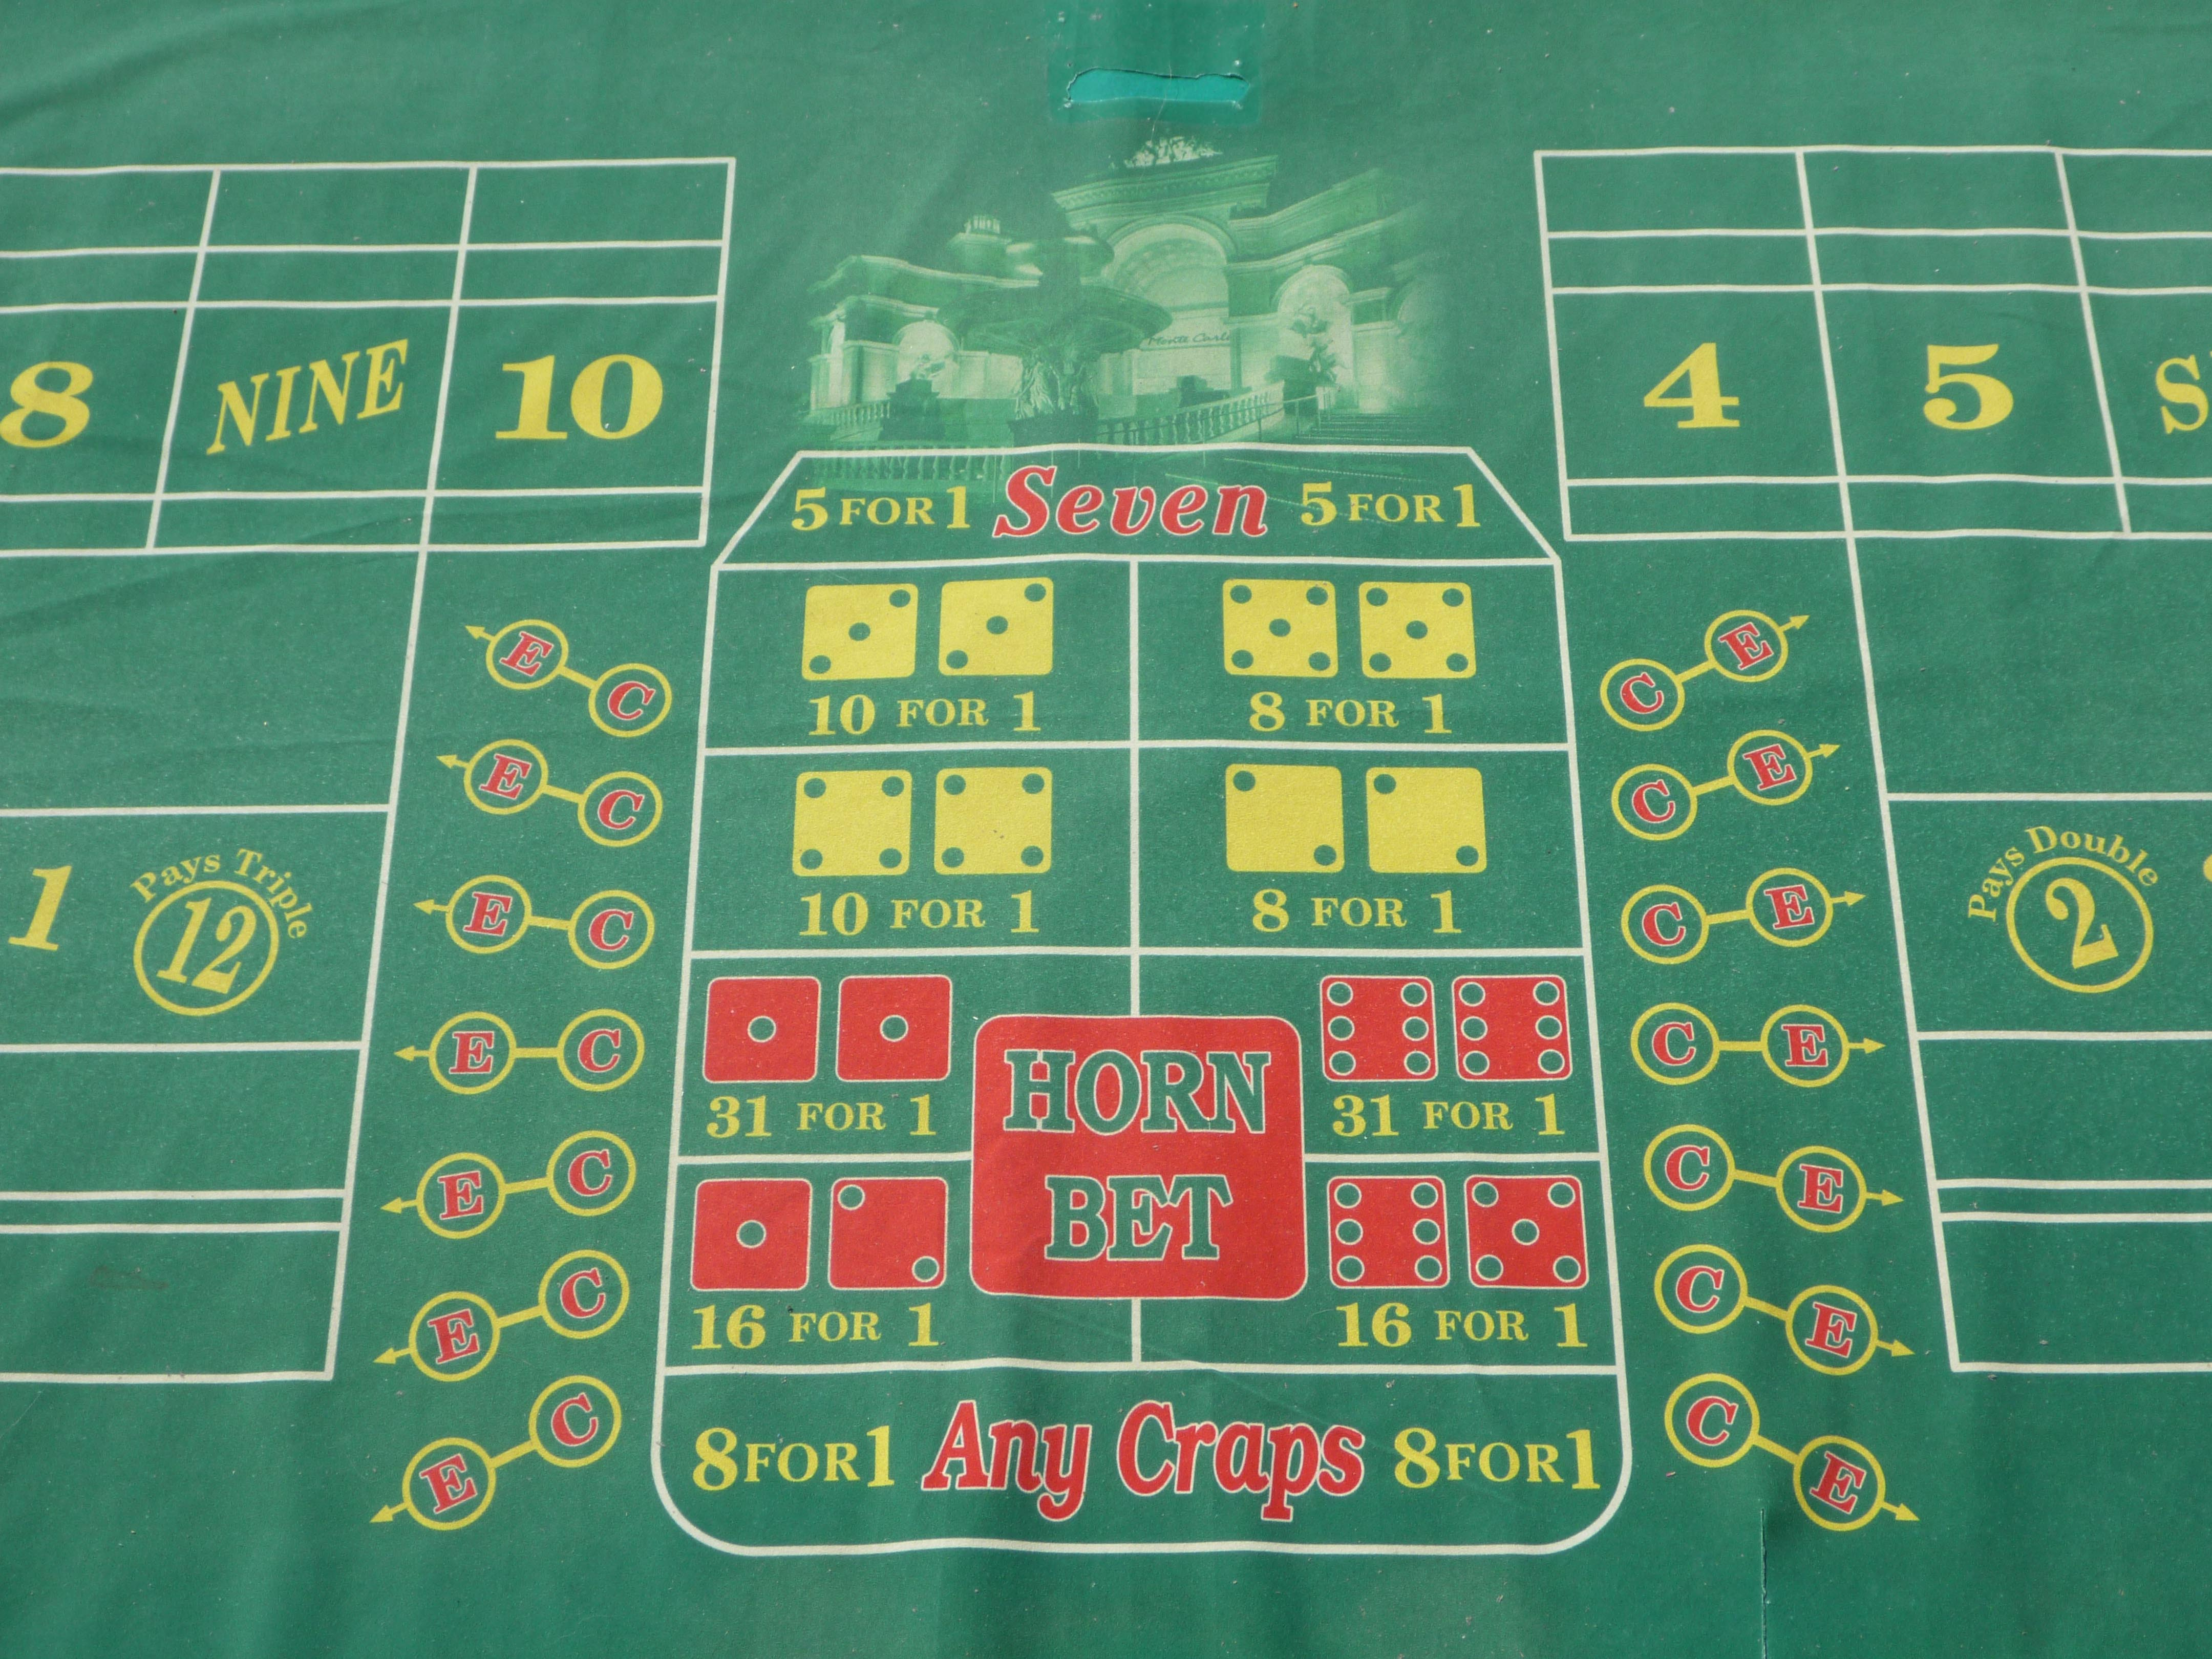 Mtt poker strategy live